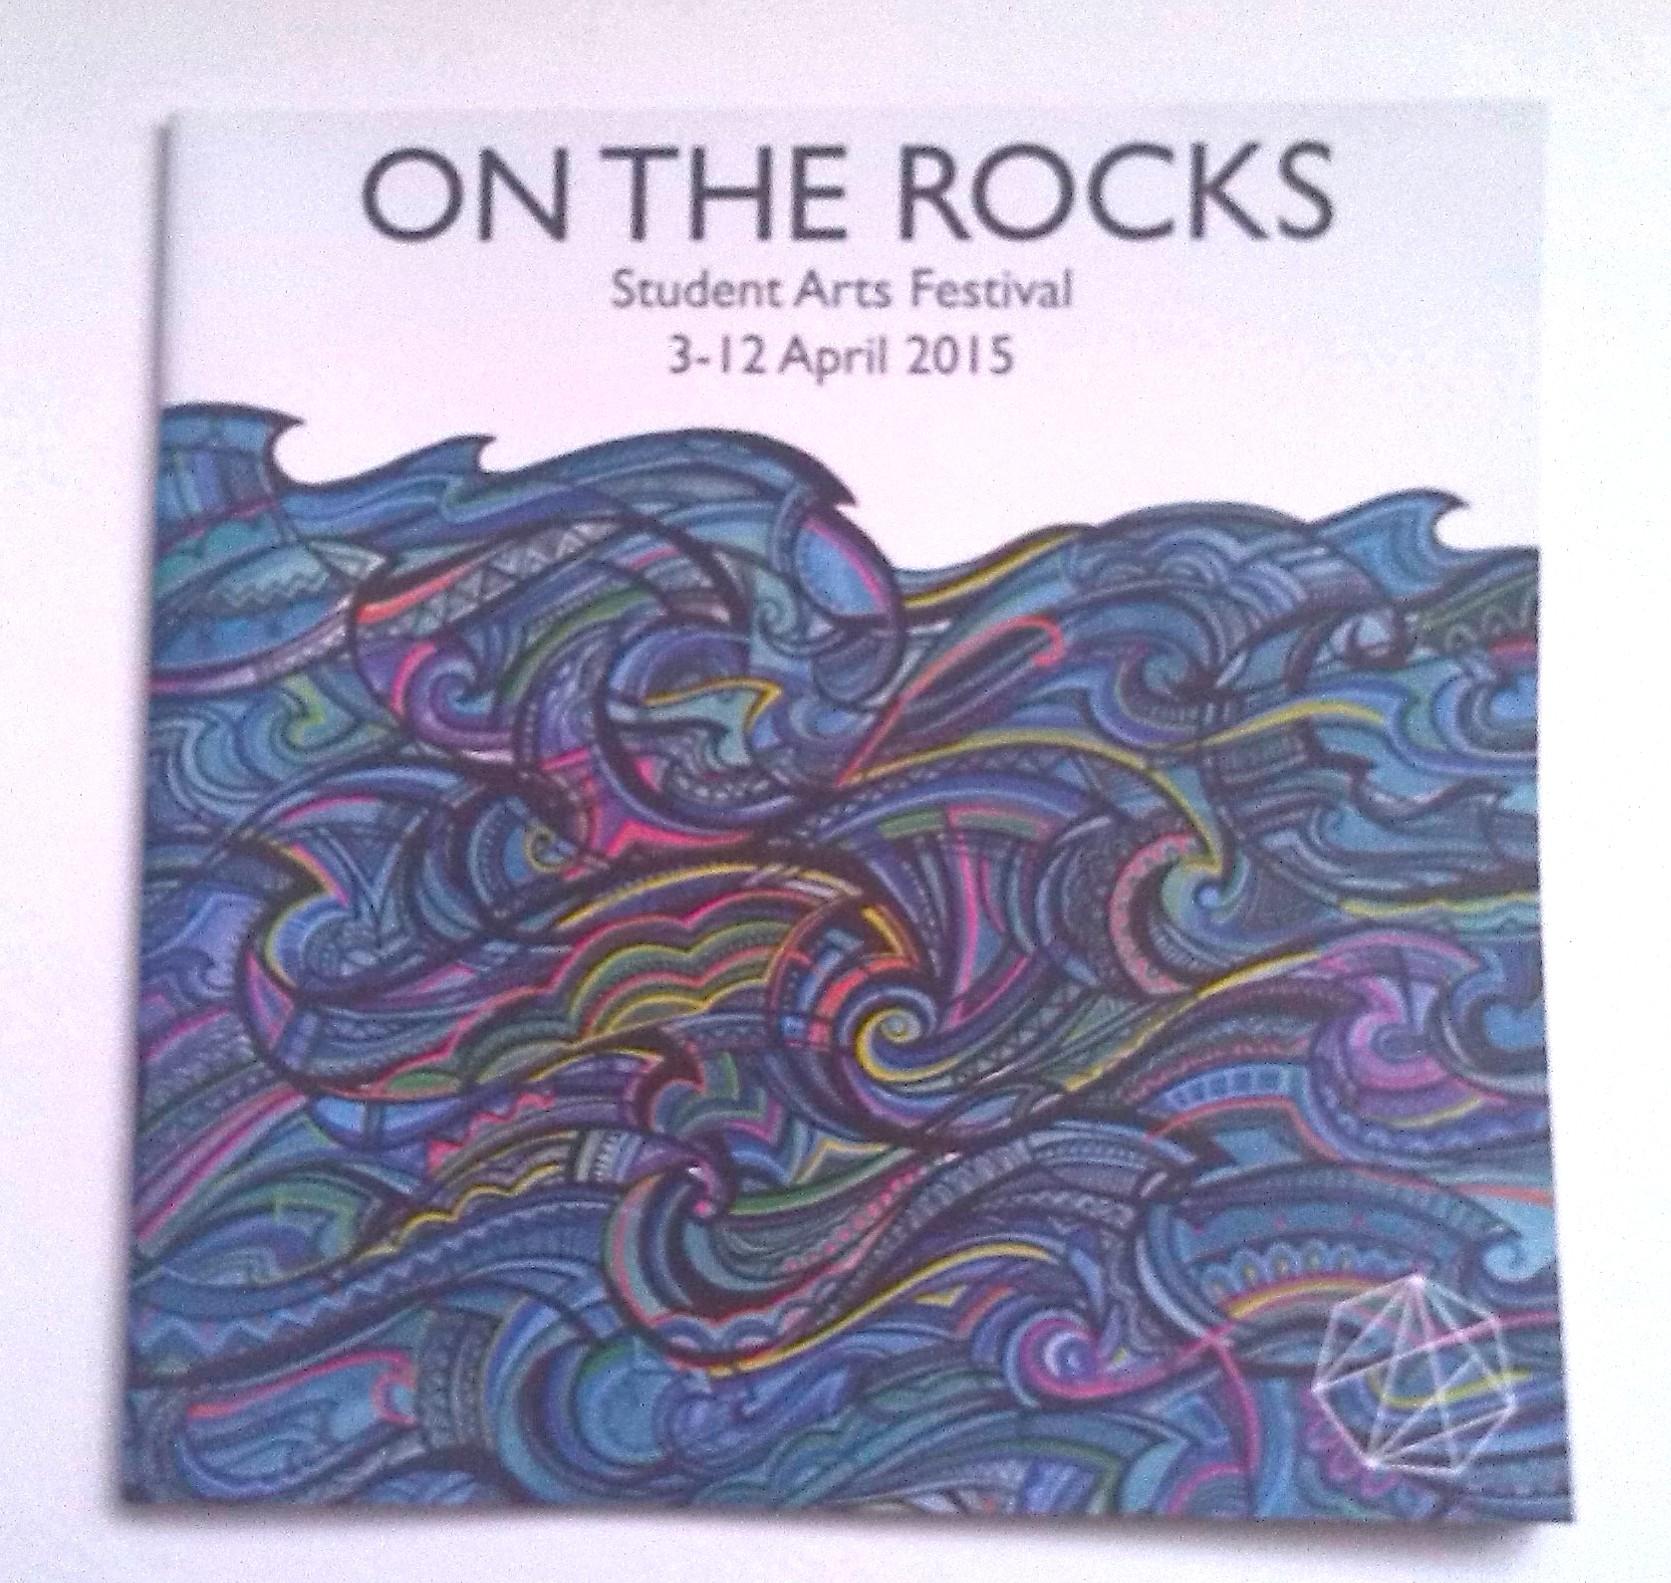 On The Rocks programme